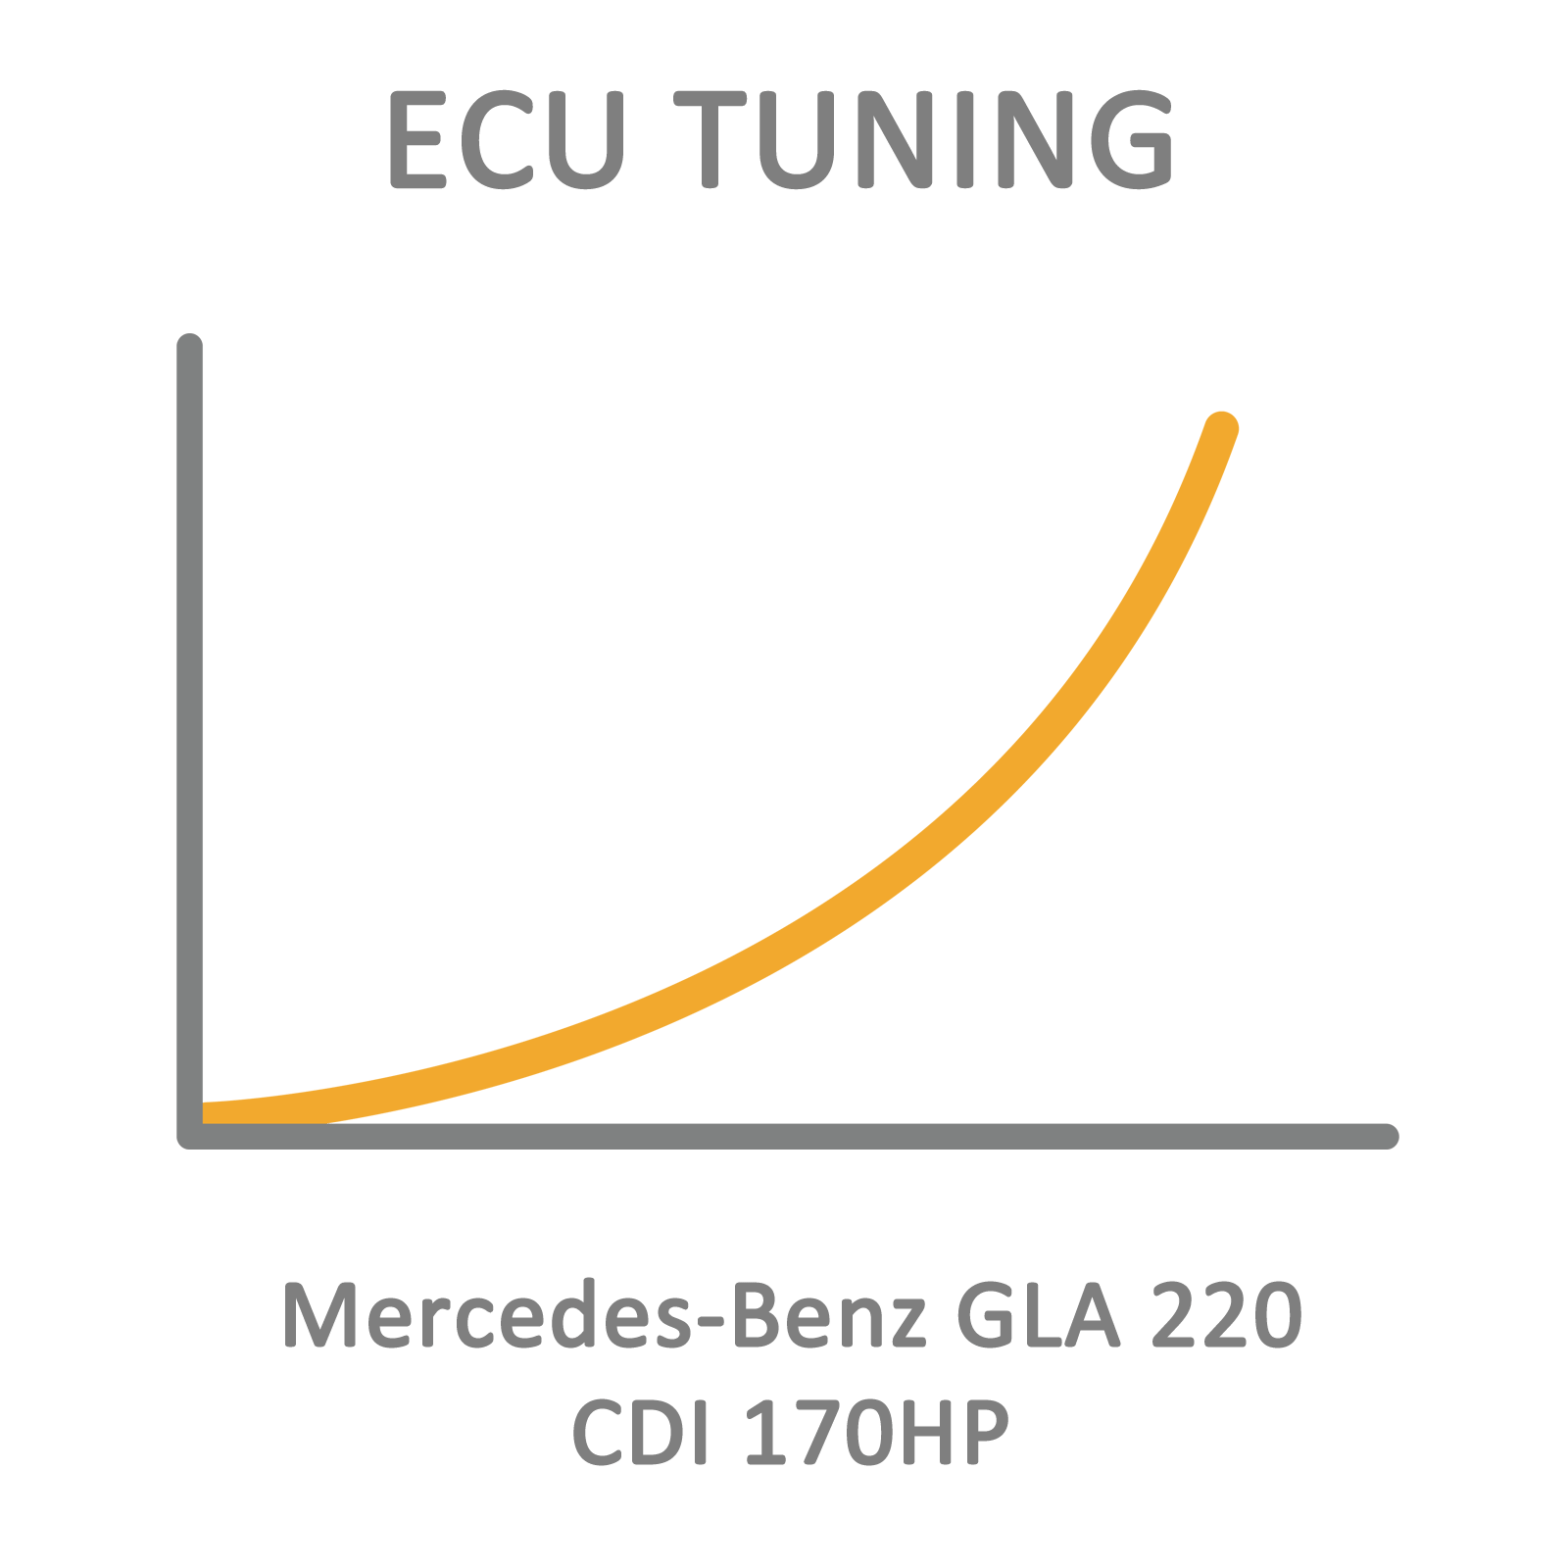 Mercedes-Benz GLA 220 CDI 170HP ECU Tuning Remapping